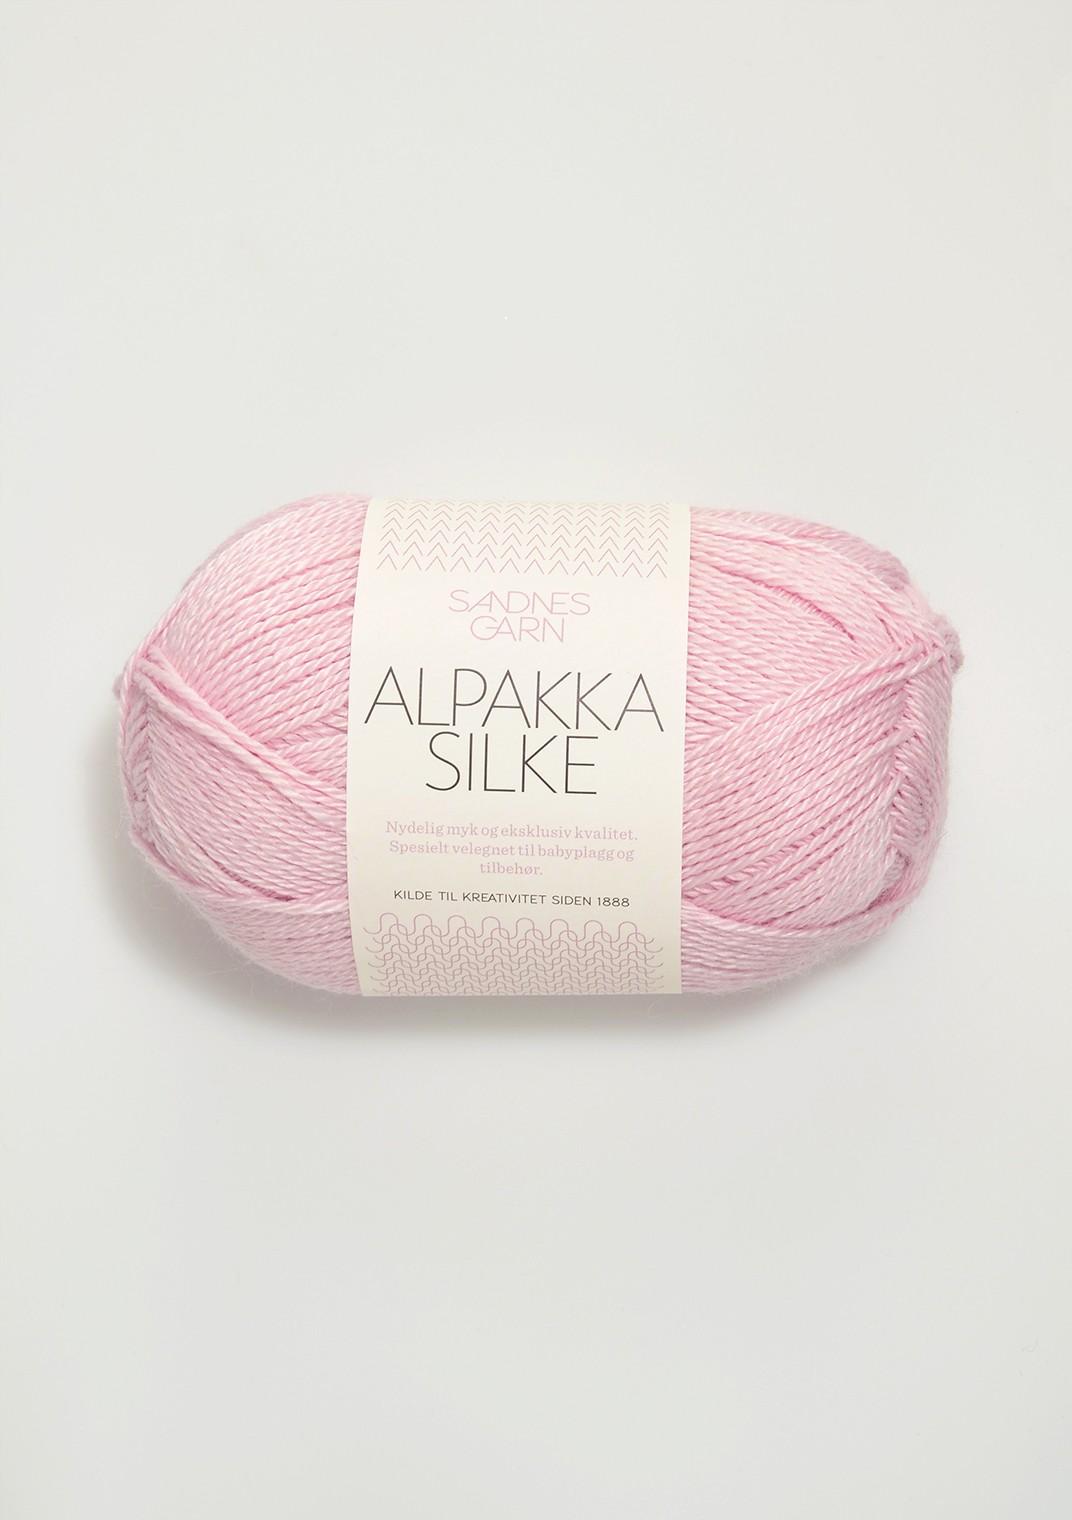 Sandnes alpakka silke rosa 3911